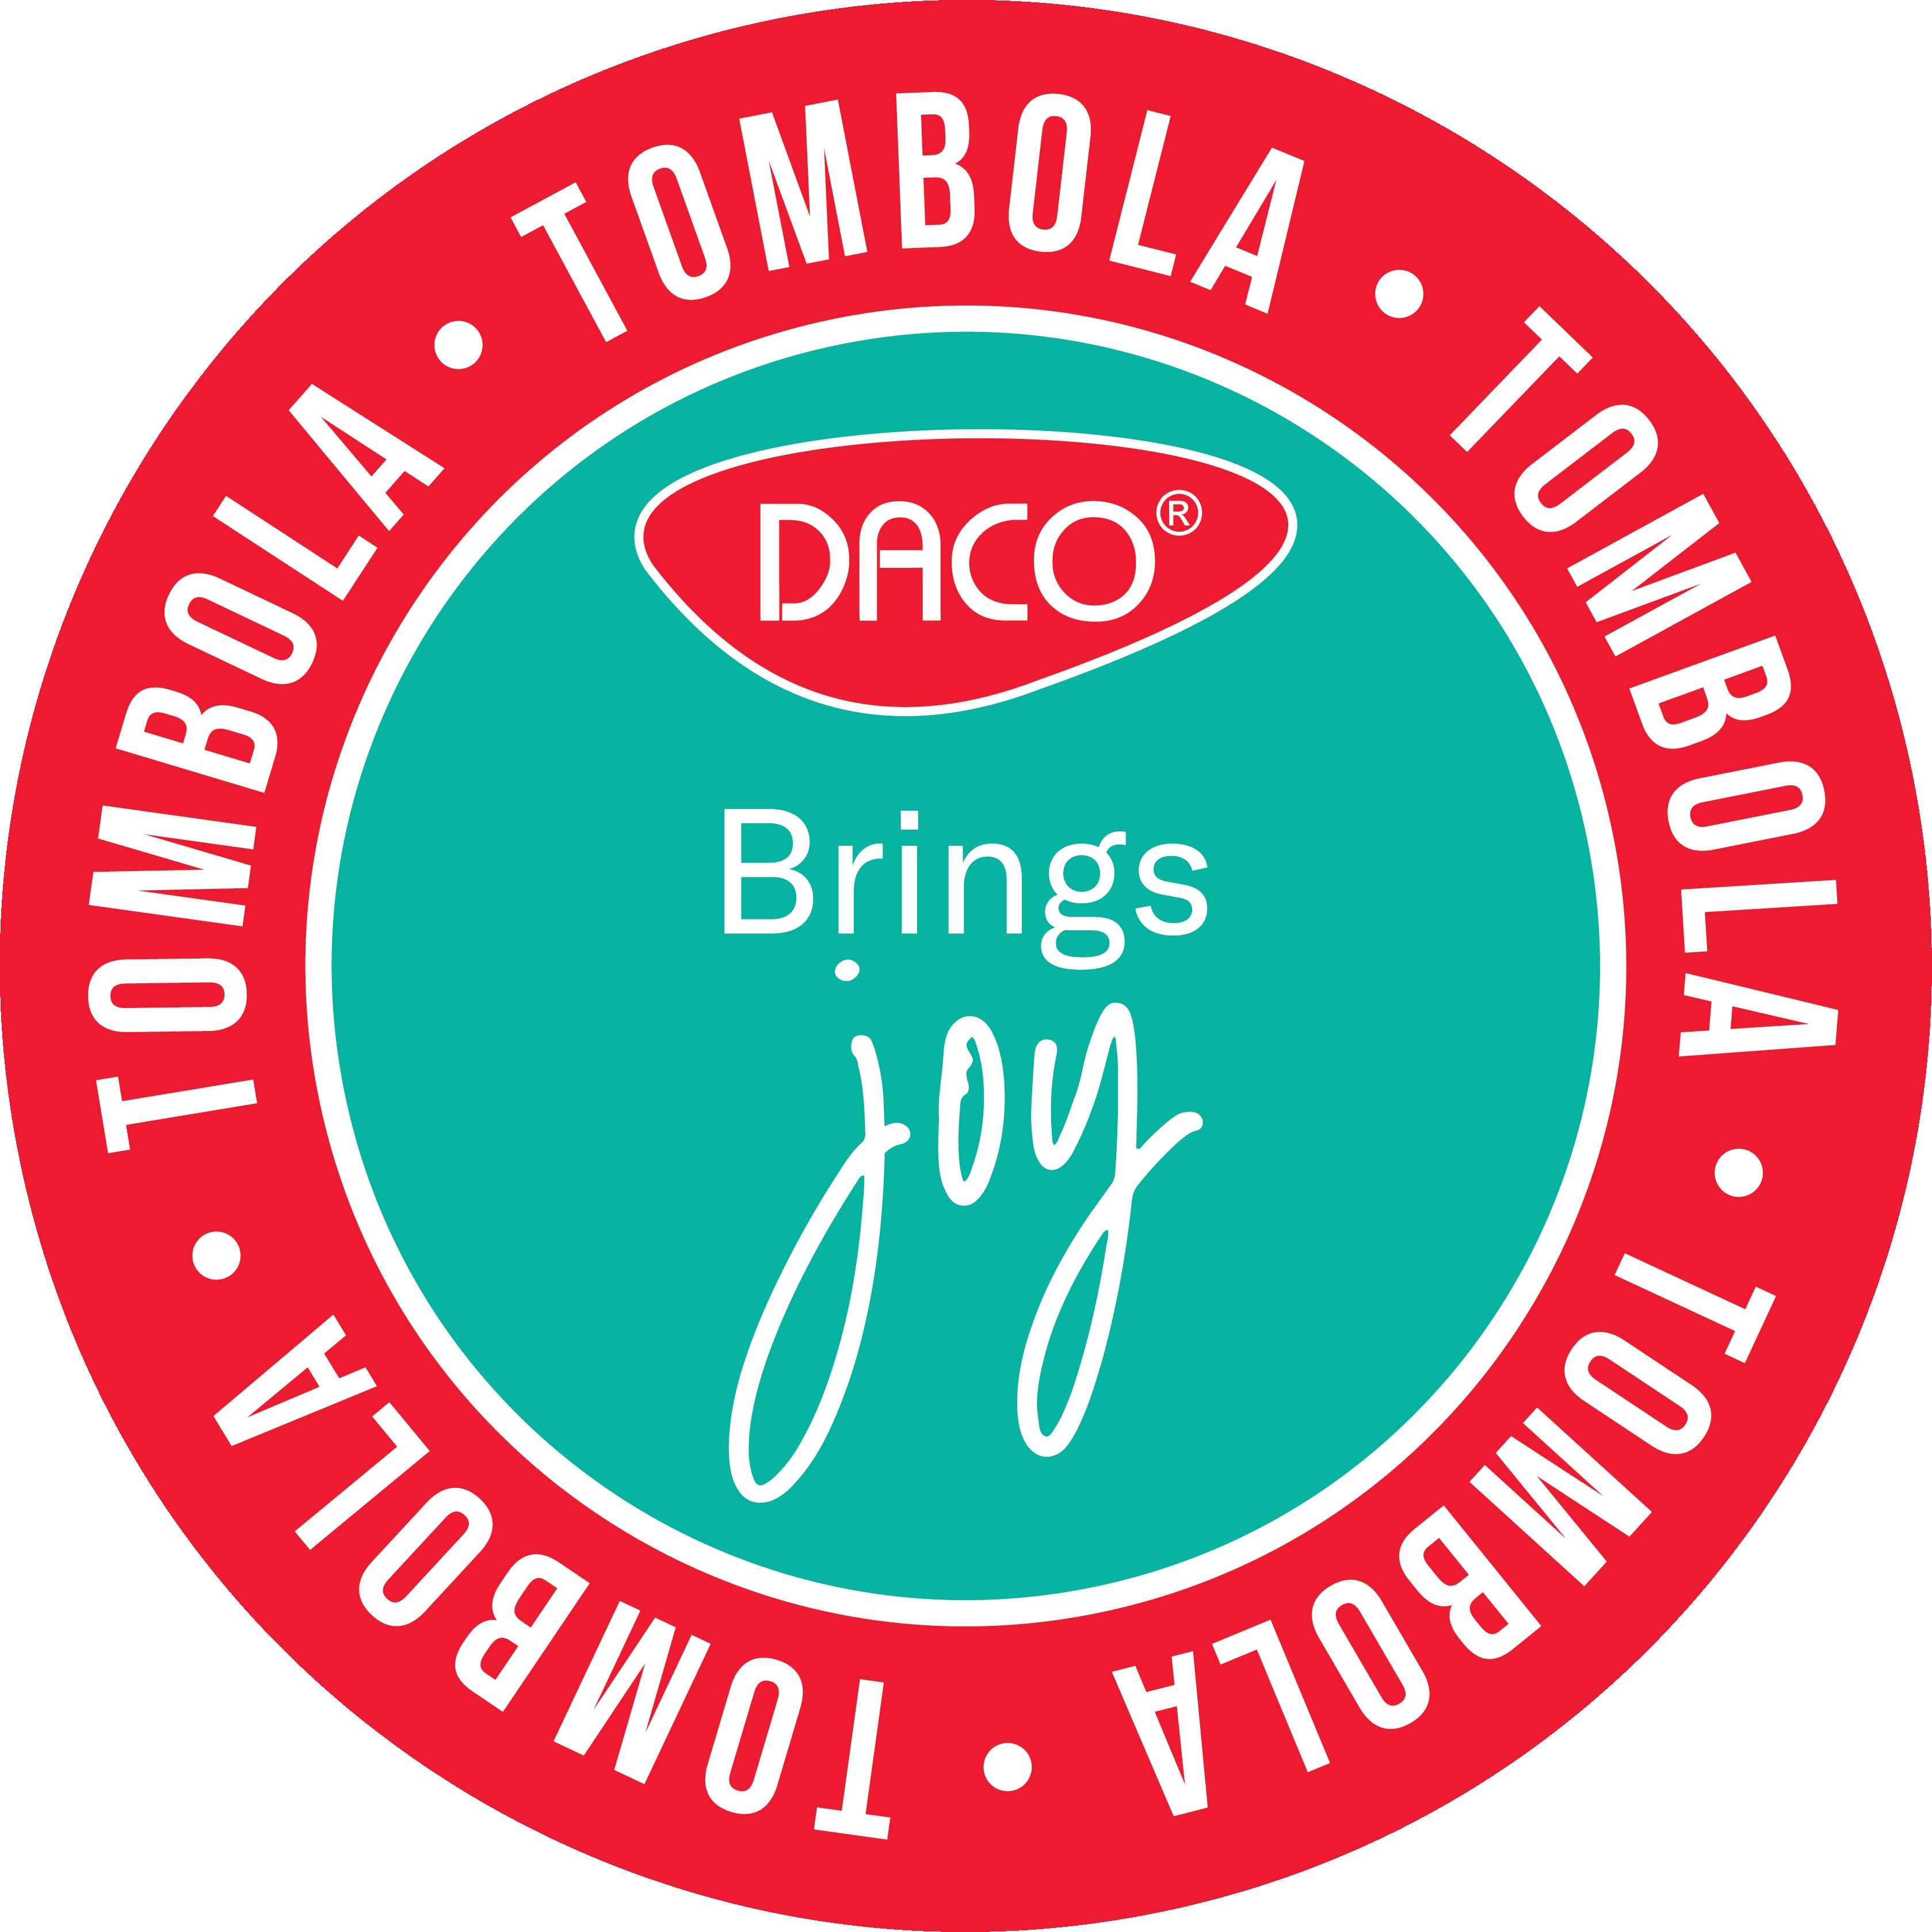 Tombola Adaconi: Bring Joy!